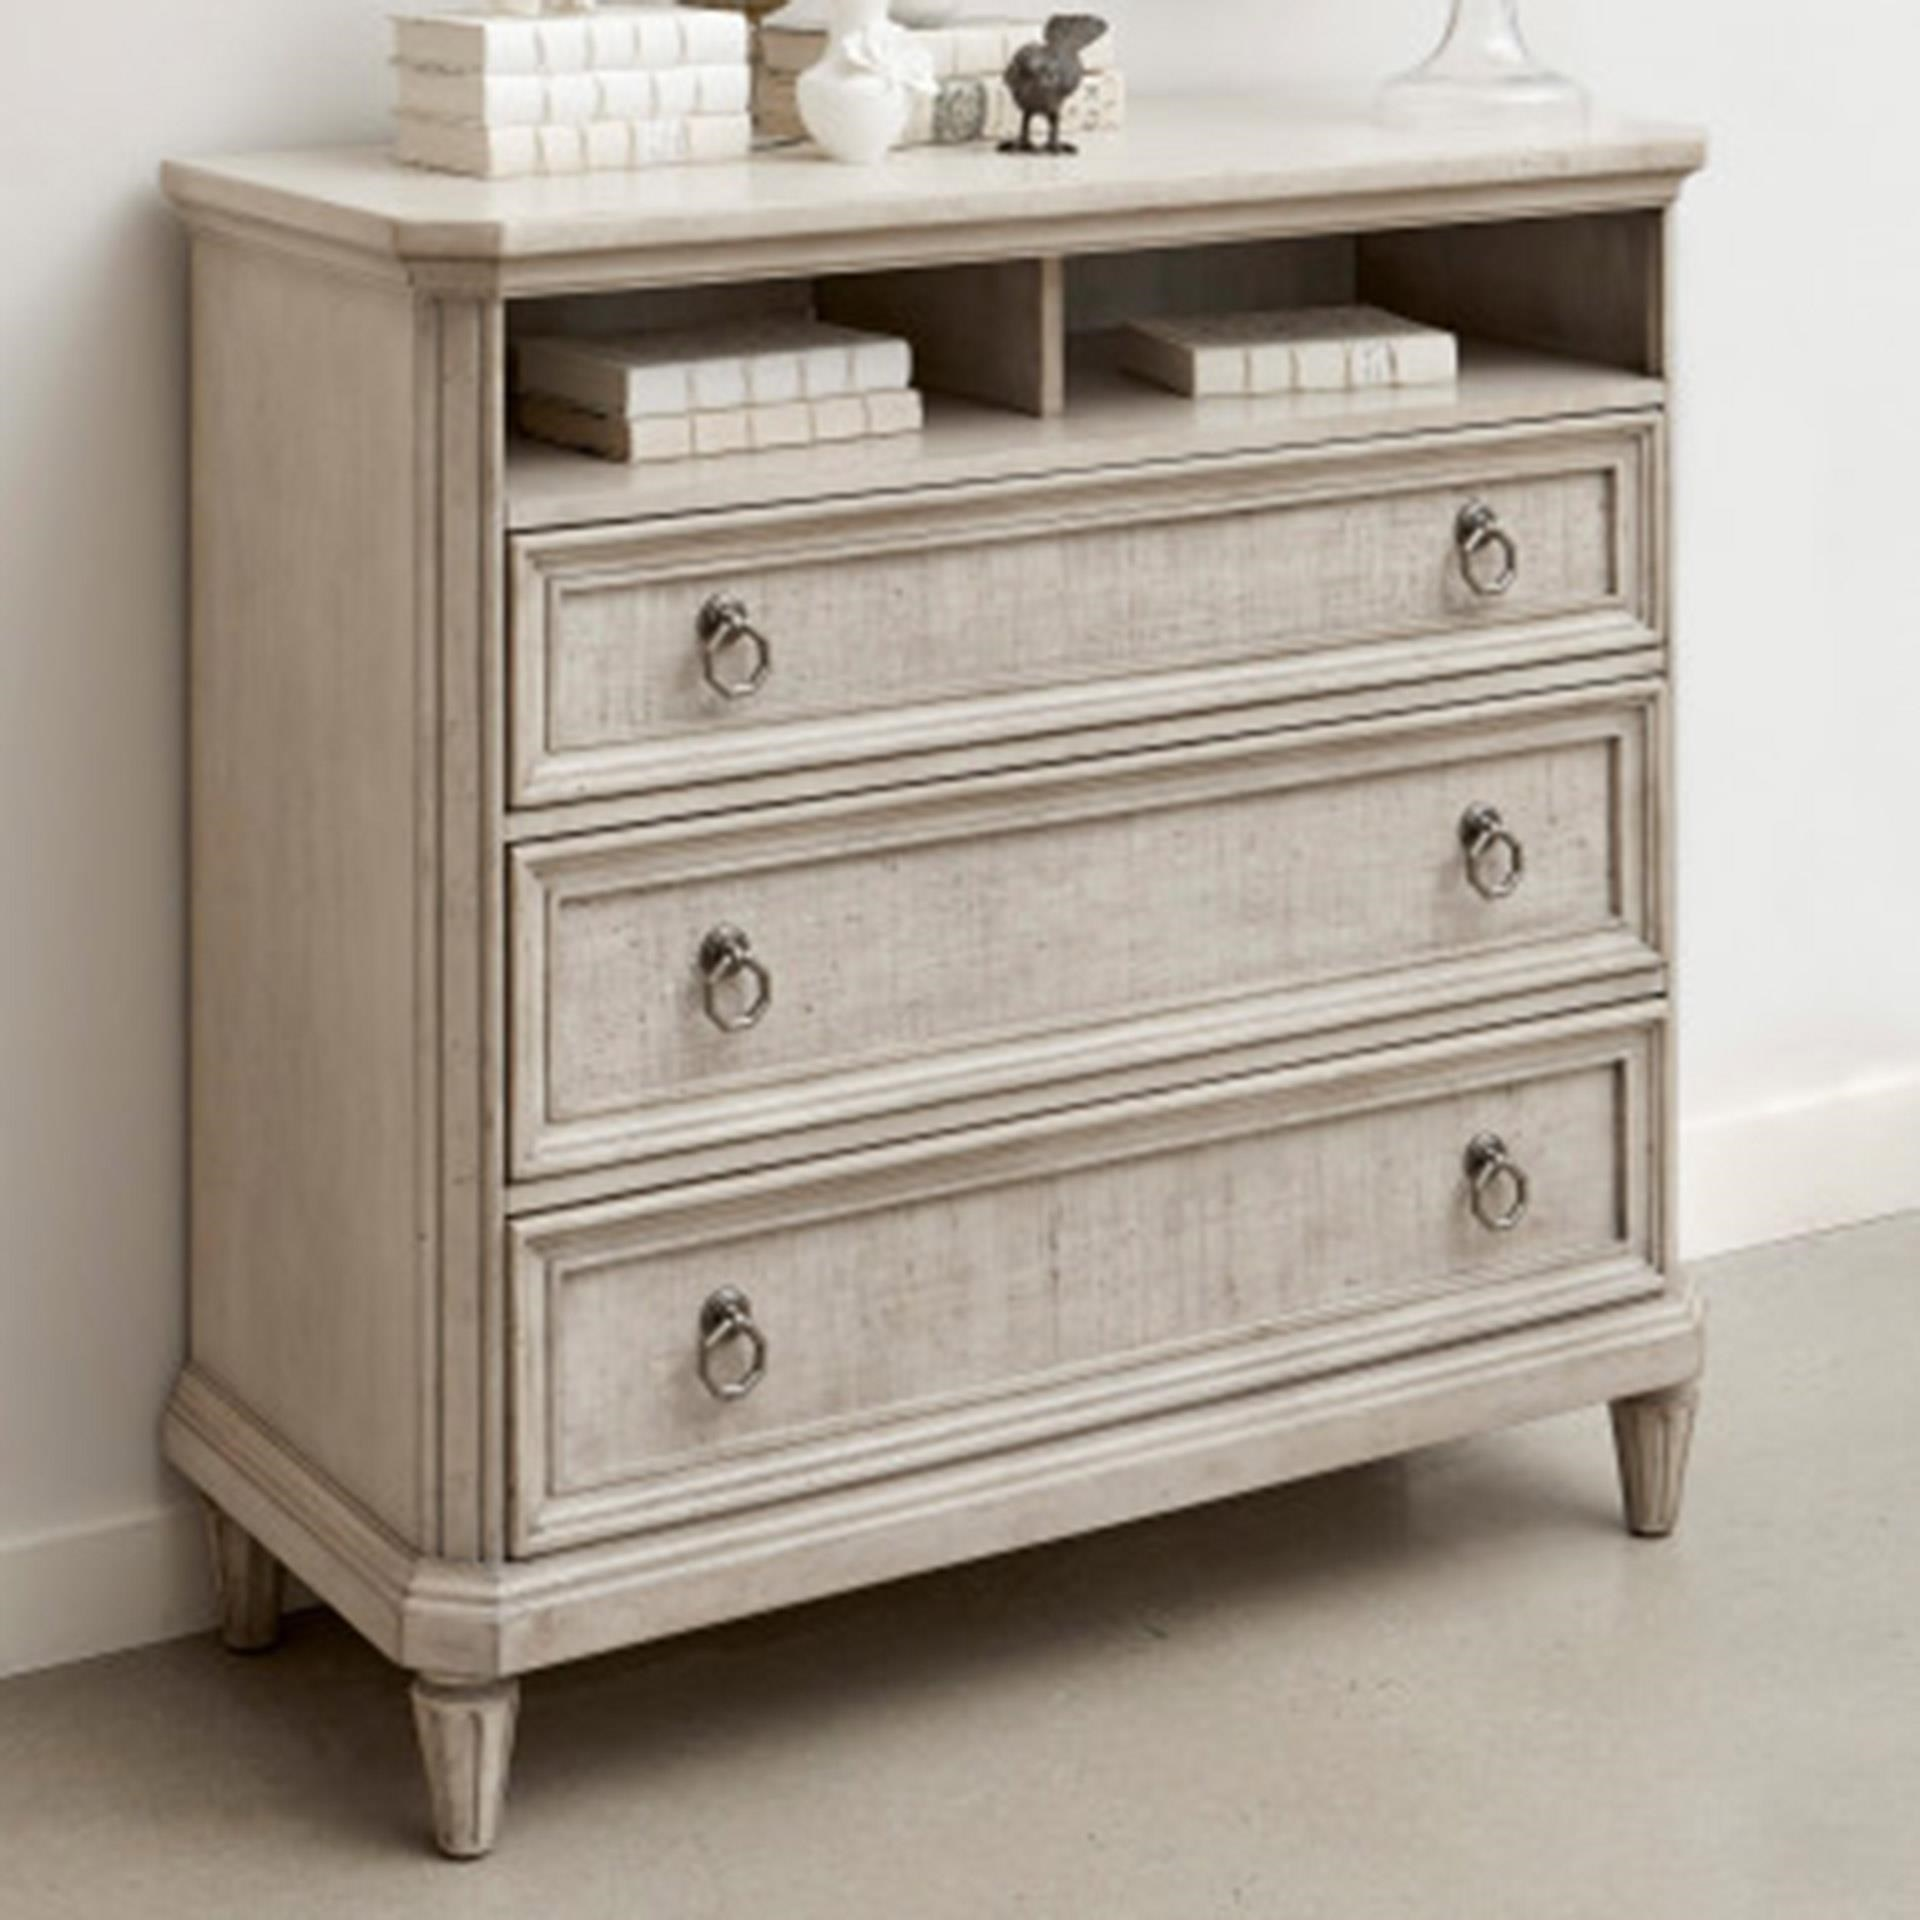 Pulaski Furniture Campbell Street Media Chest - Item Number: P123145